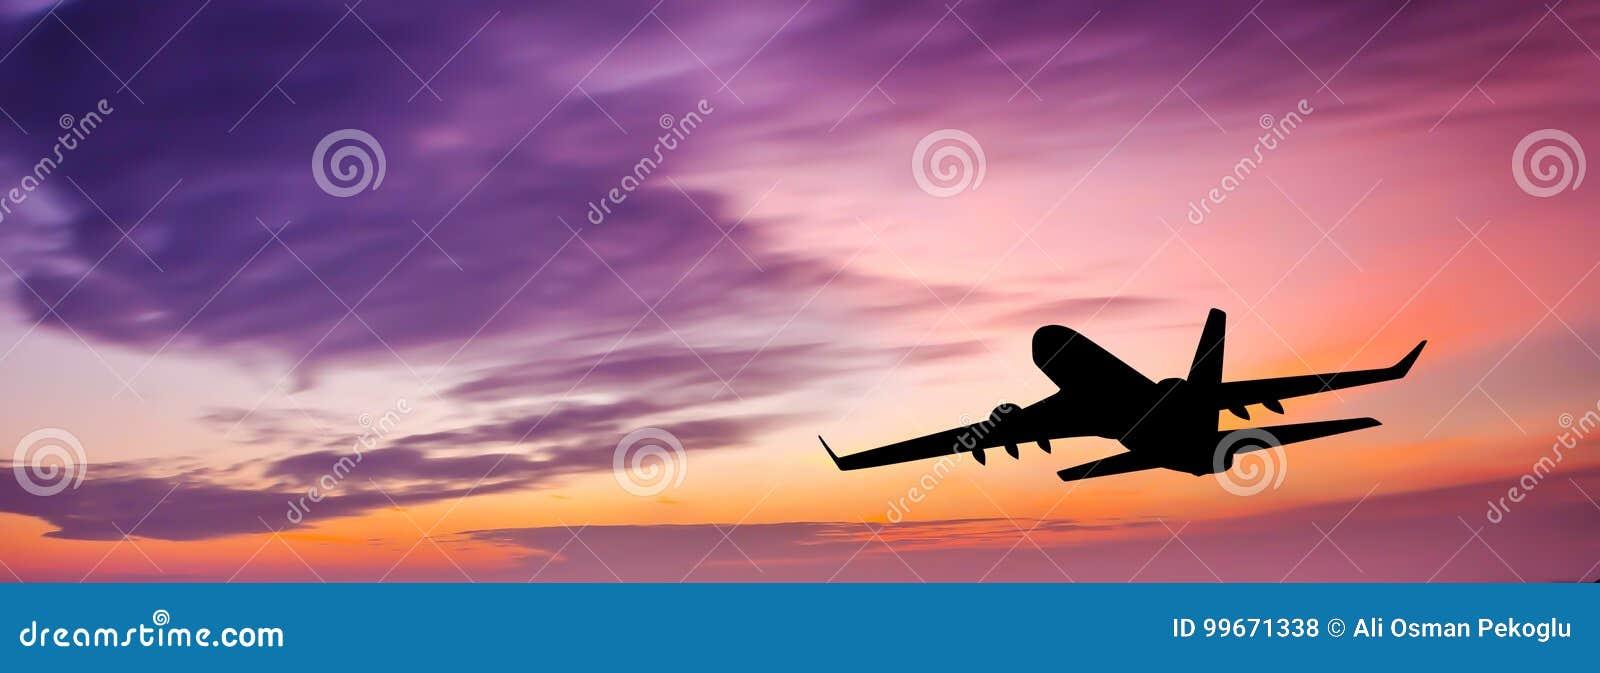 Download Passenger plane at sunset stock photo. Image of aircraft - 99671338